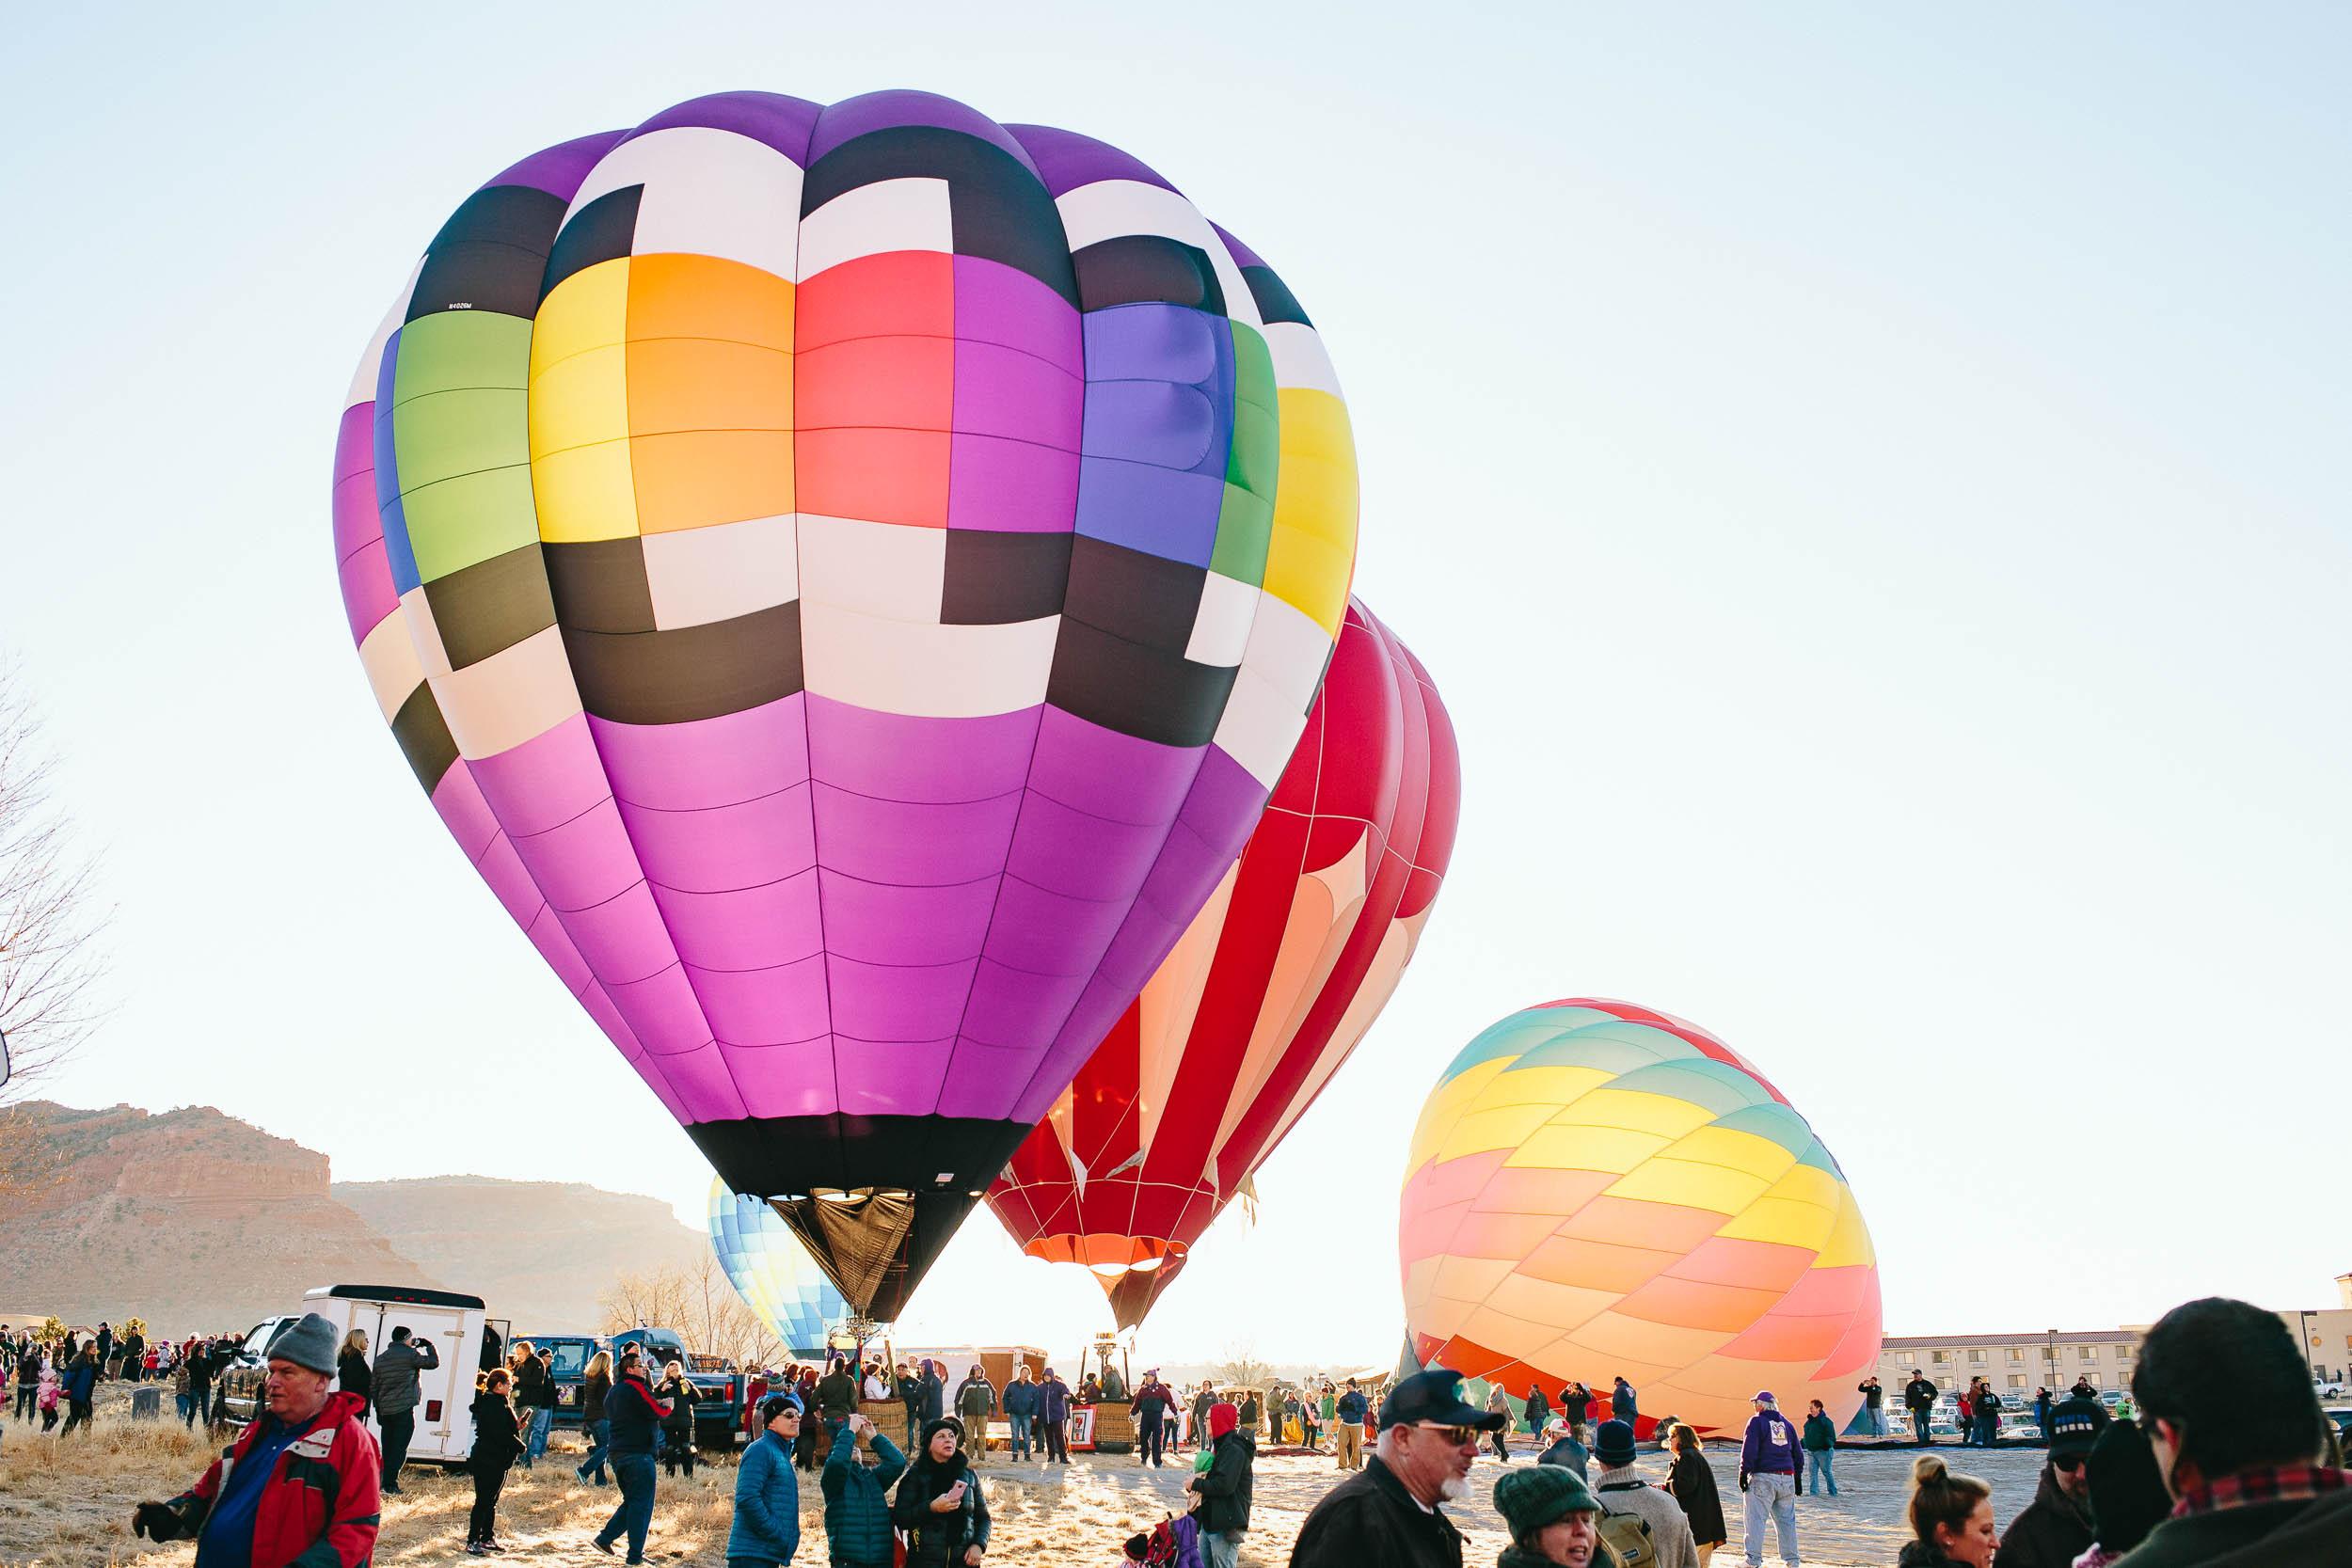 Kyle-Sheppard-Kanab-Balloon-Festival-11.jpg